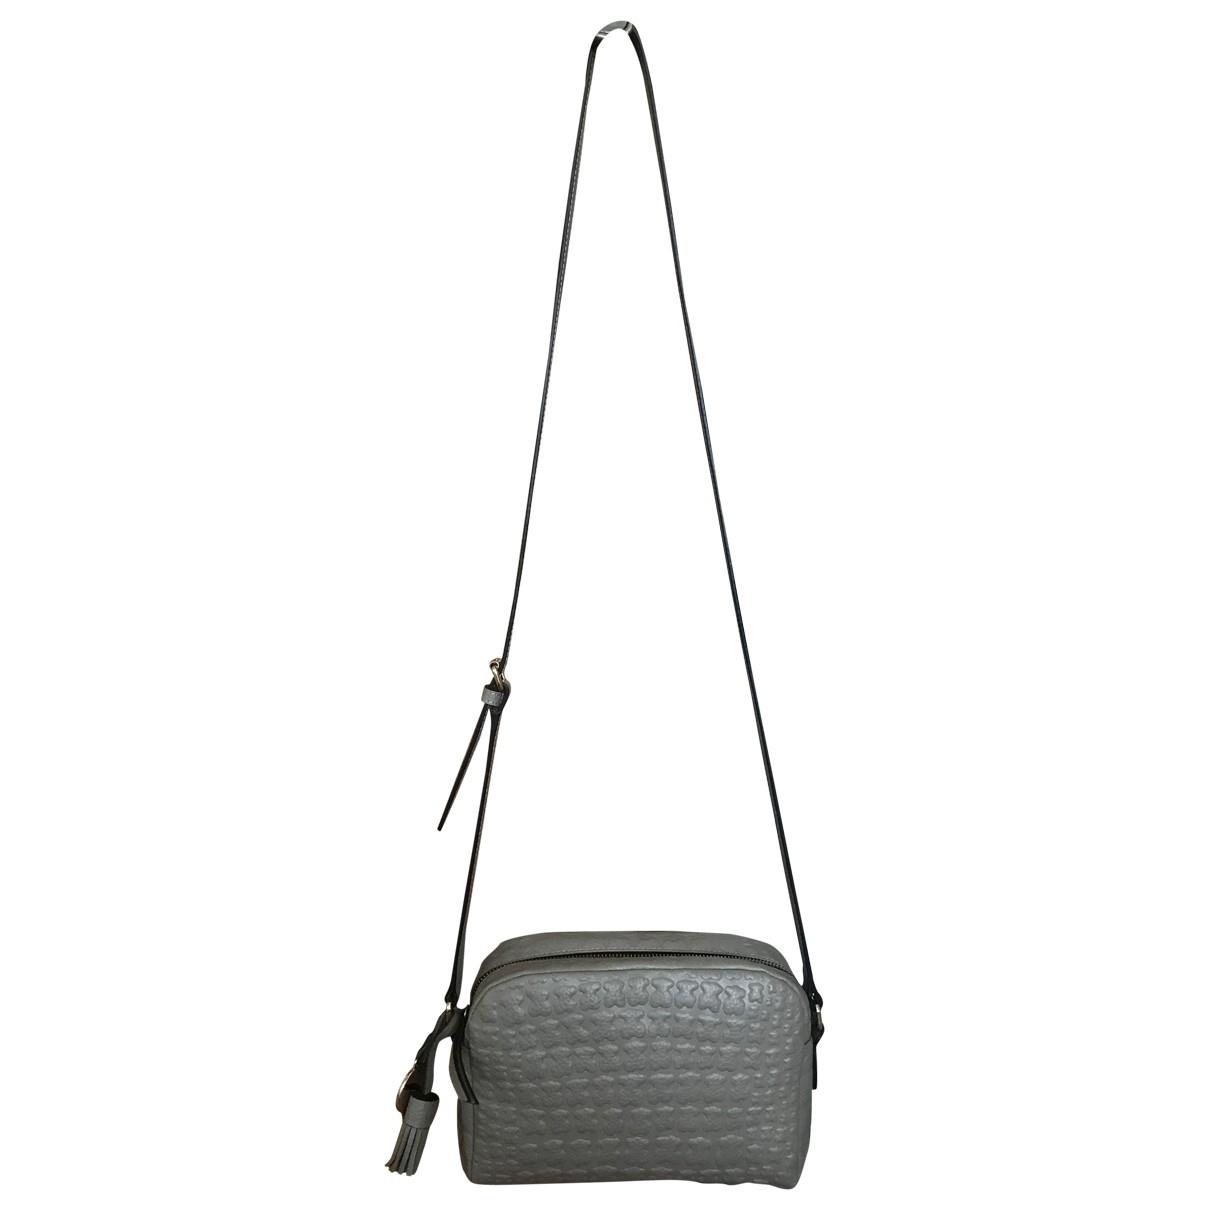 Atelier Tous \N Handtasche in  Grau Leder